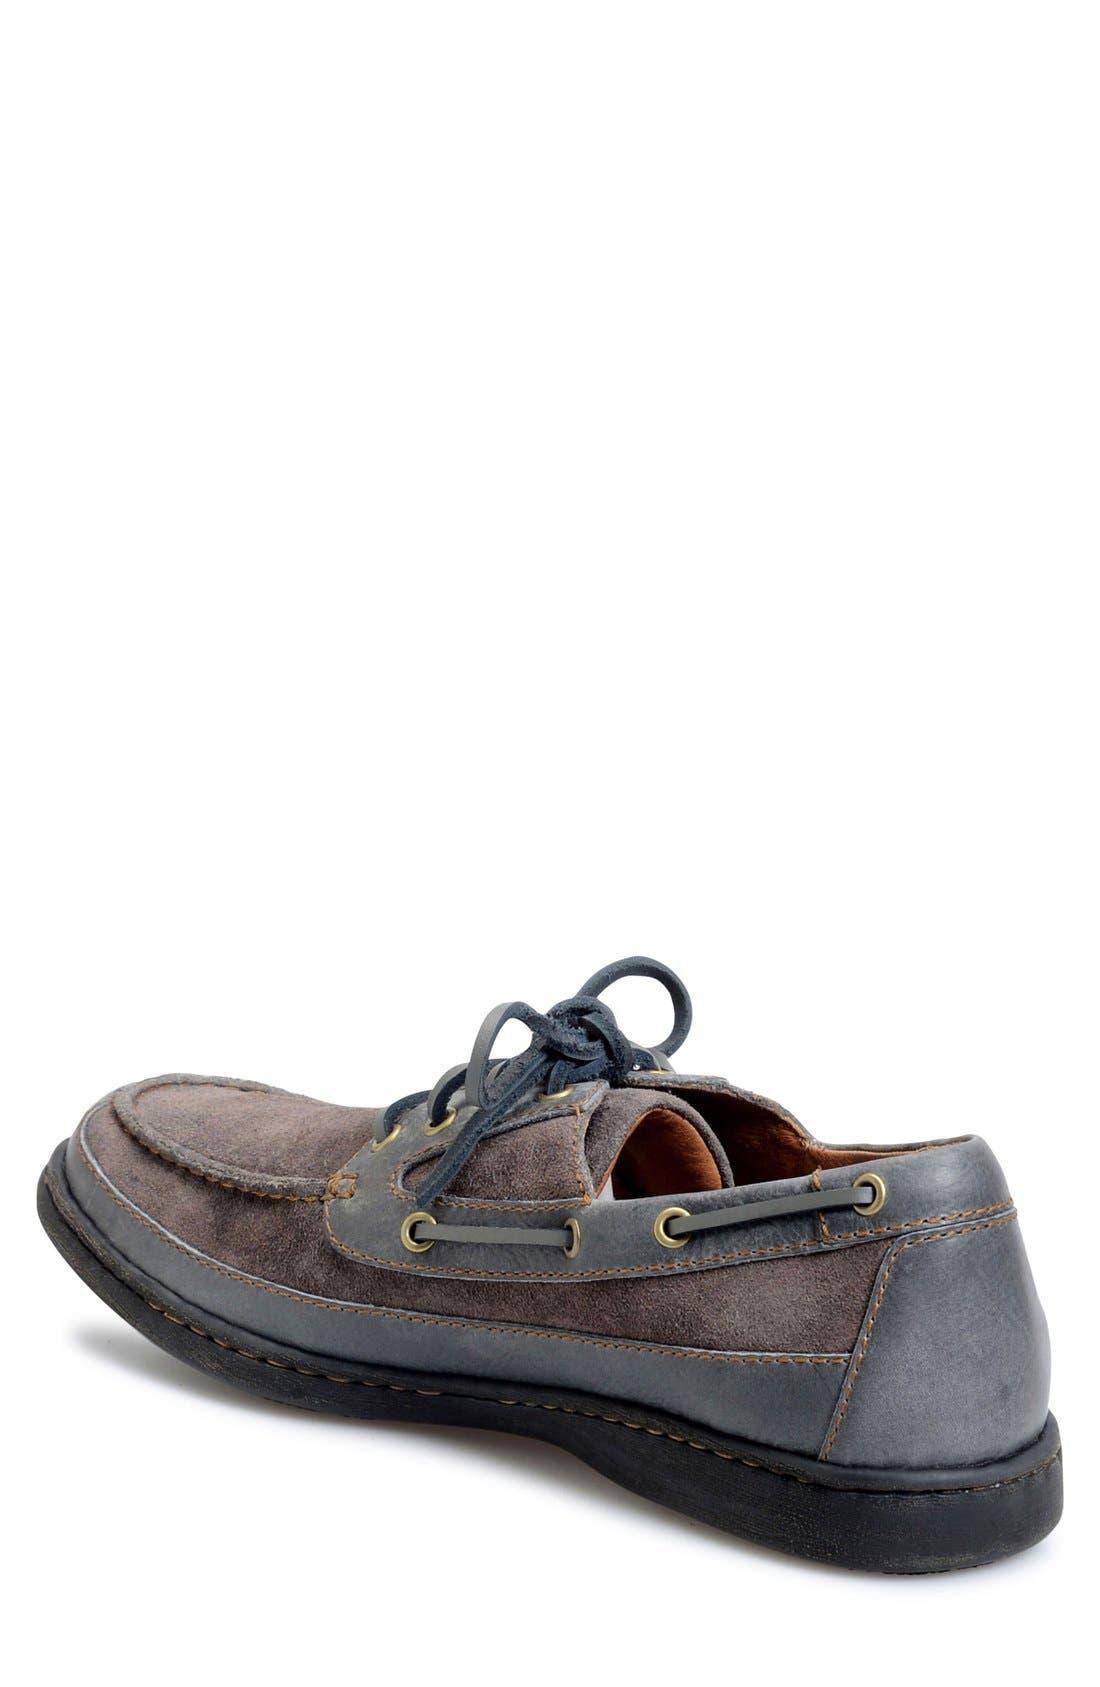 'Harwich' Boat Shoe,                             Alternate thumbnail 2, color,                             020